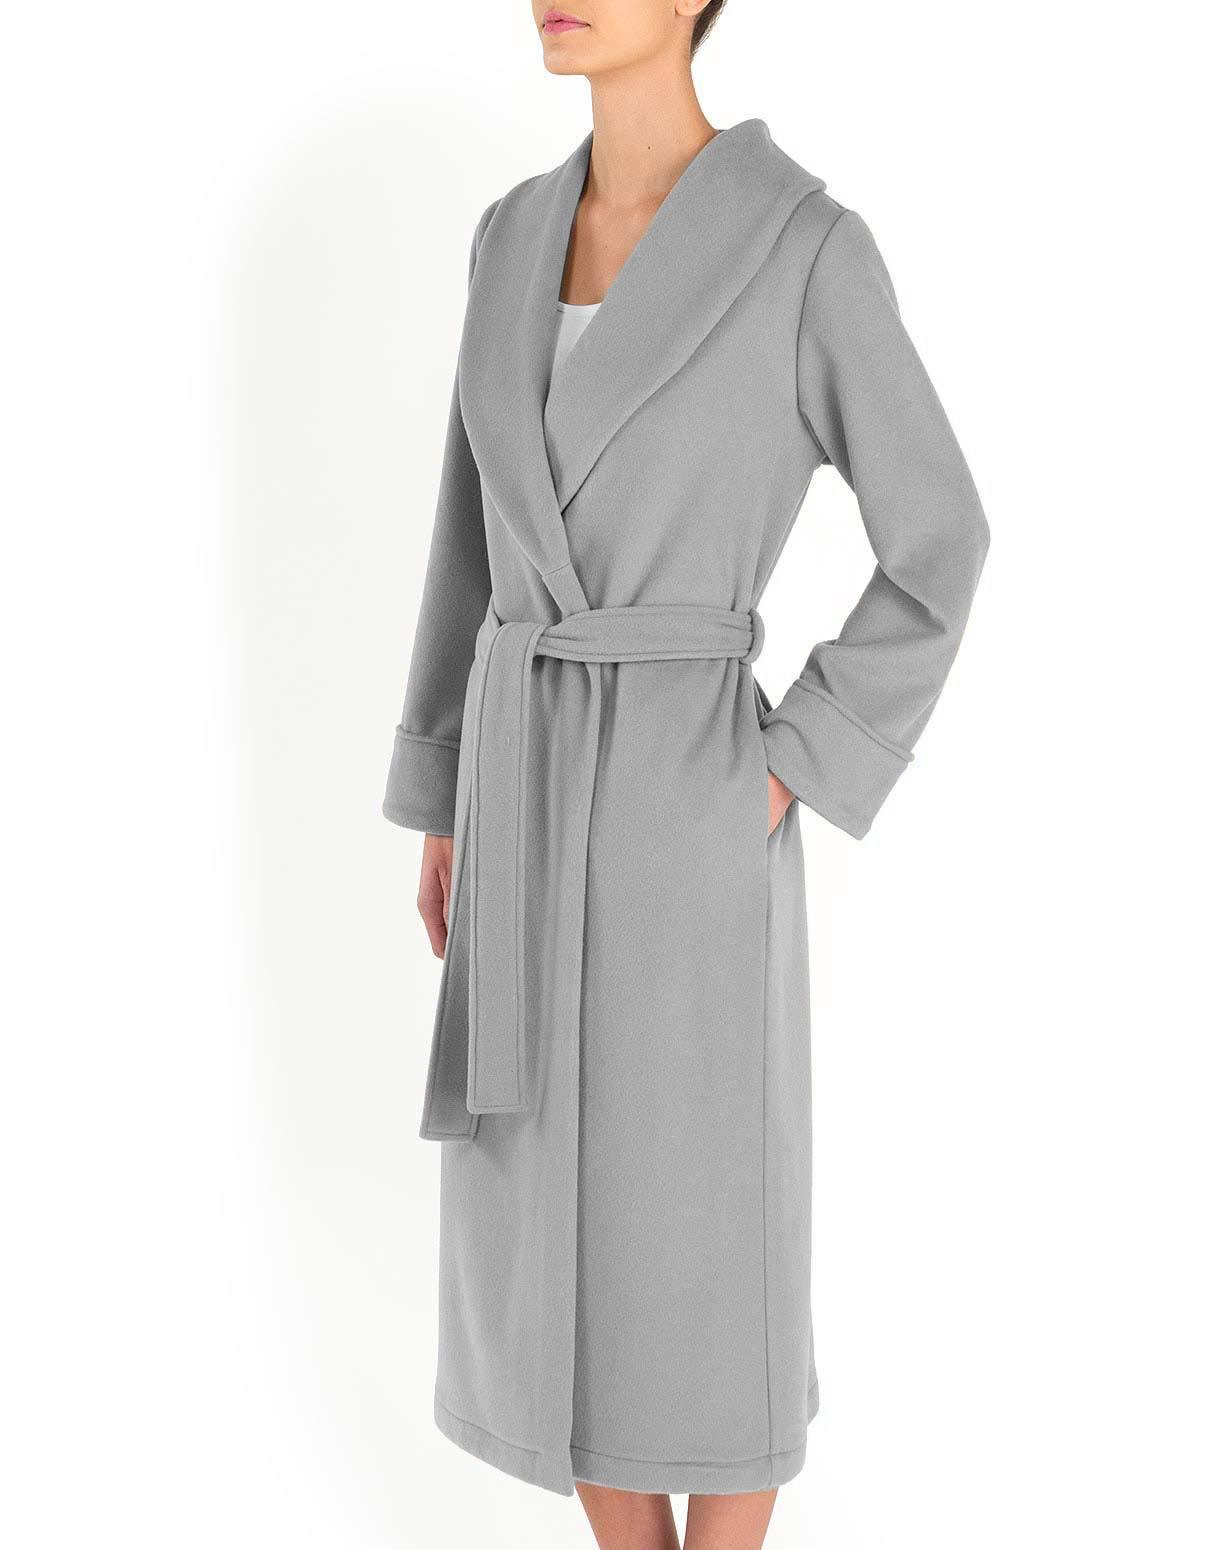 Women's Pure Cashmere Felt Robe